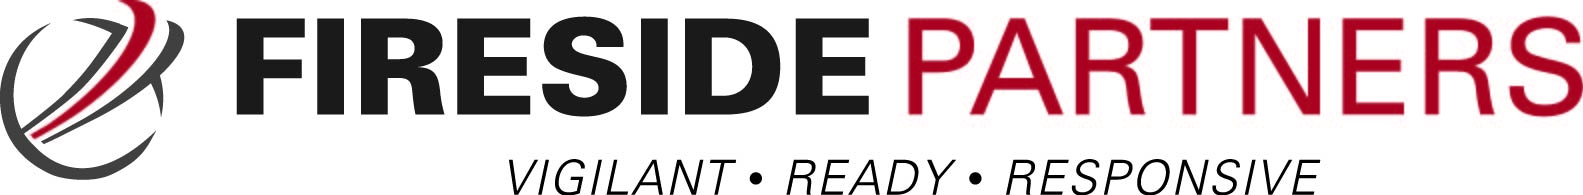 Fireside Partners Logo